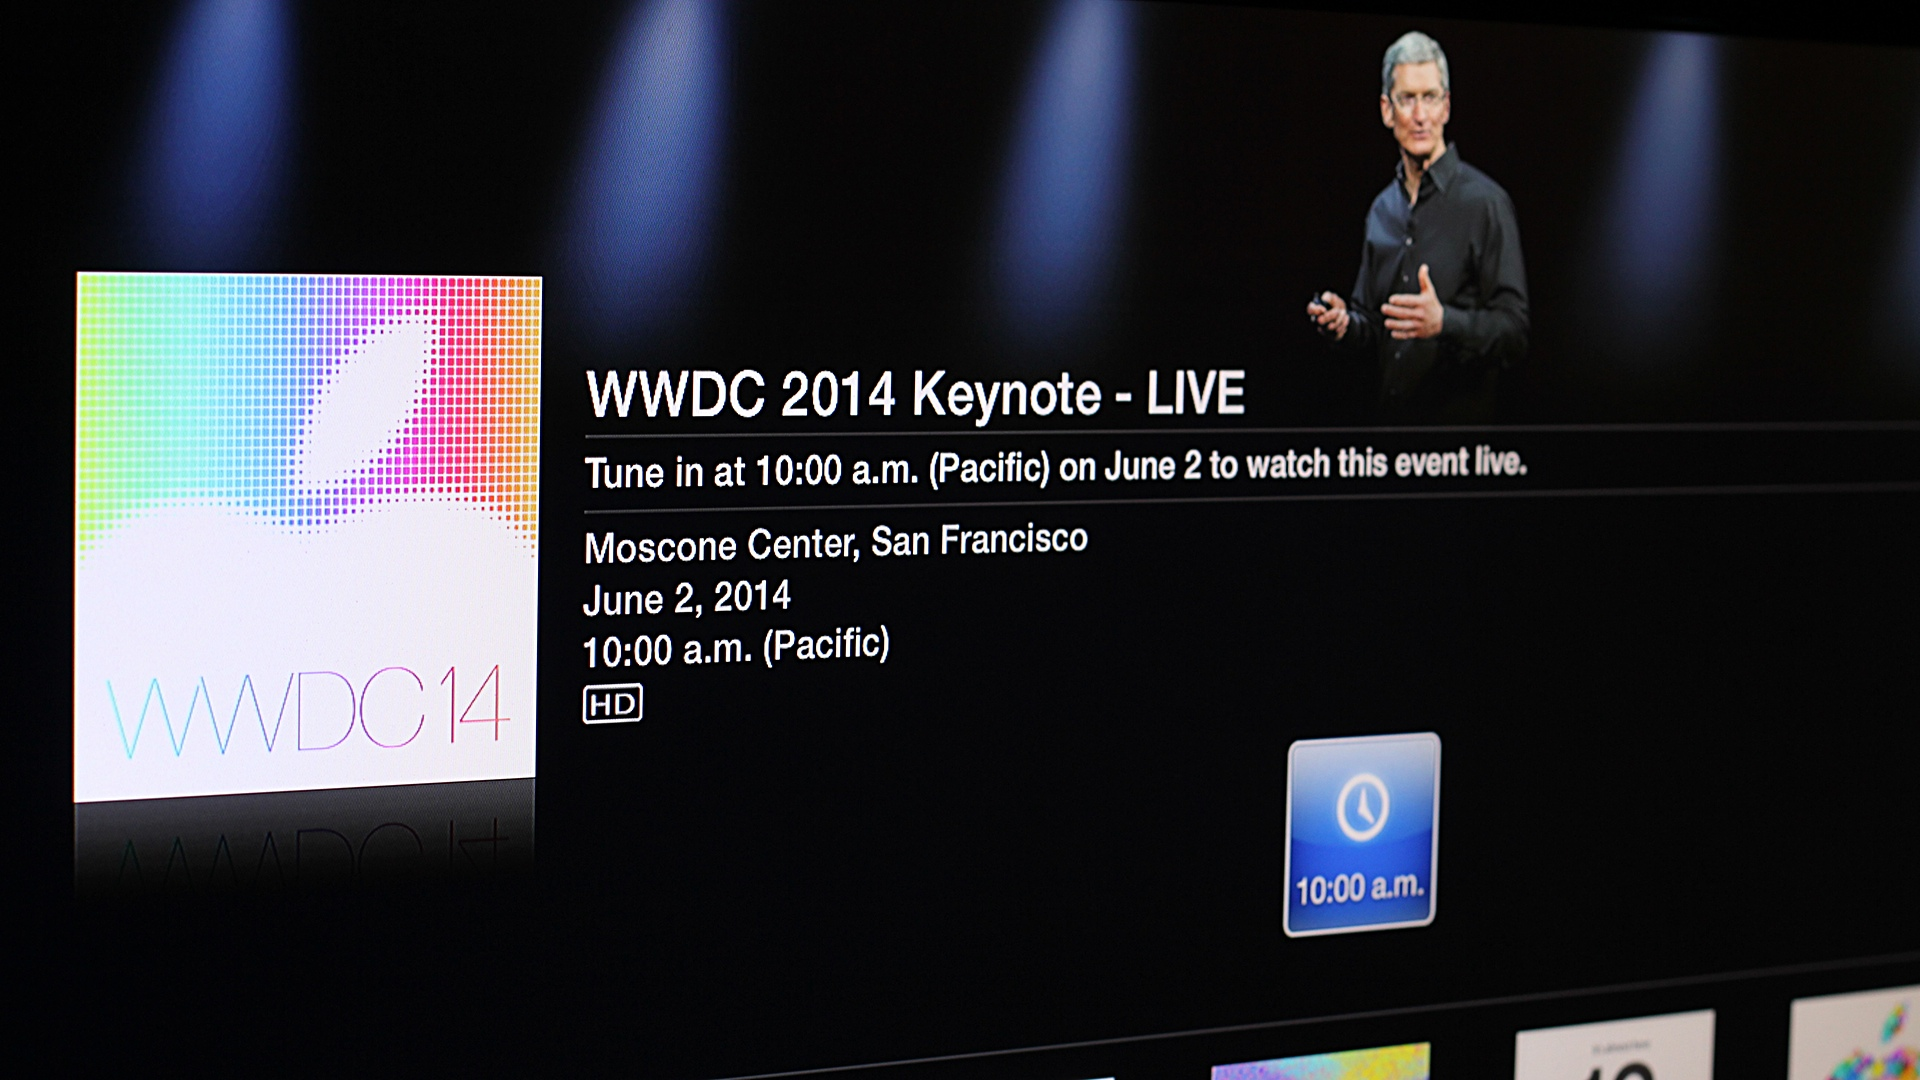 WWDC 2014 Keynote Live Apple TV